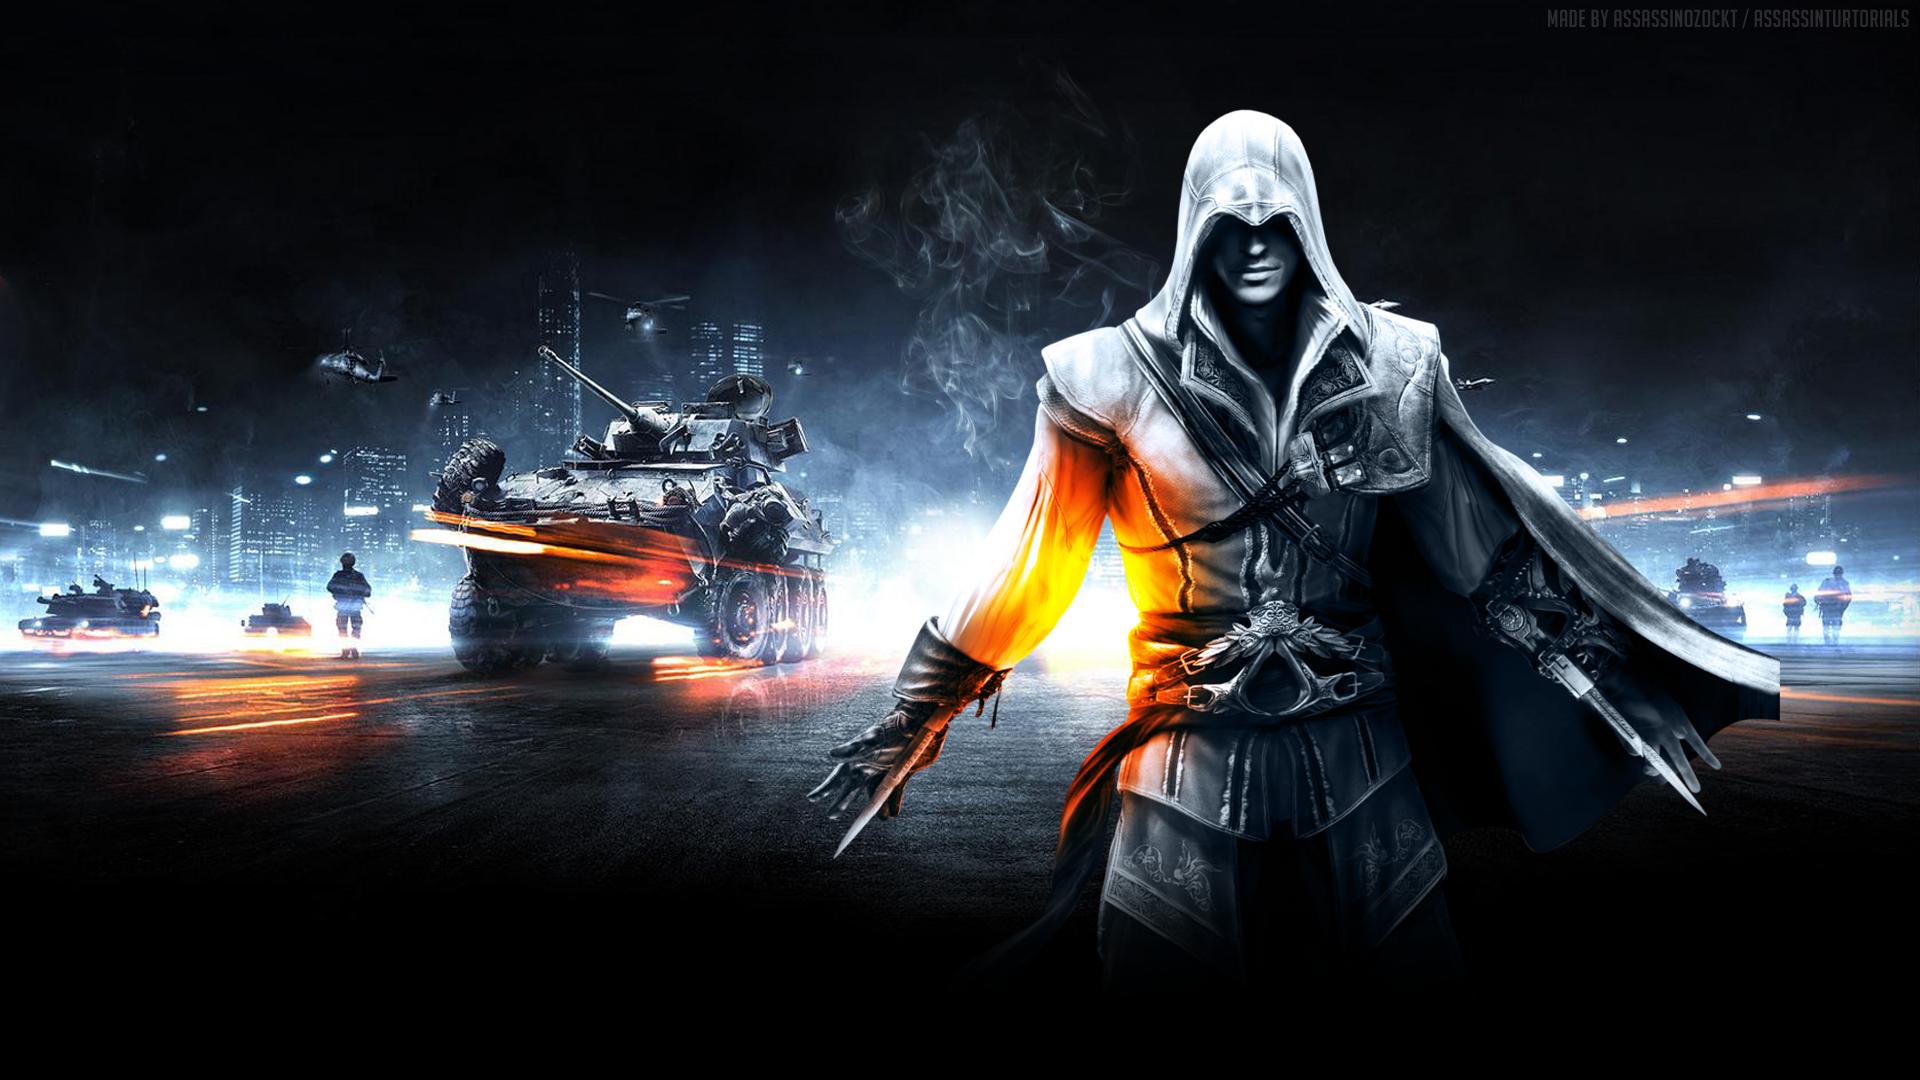 video game backgrounds | latest hd wallpapers | Военный | pinterest